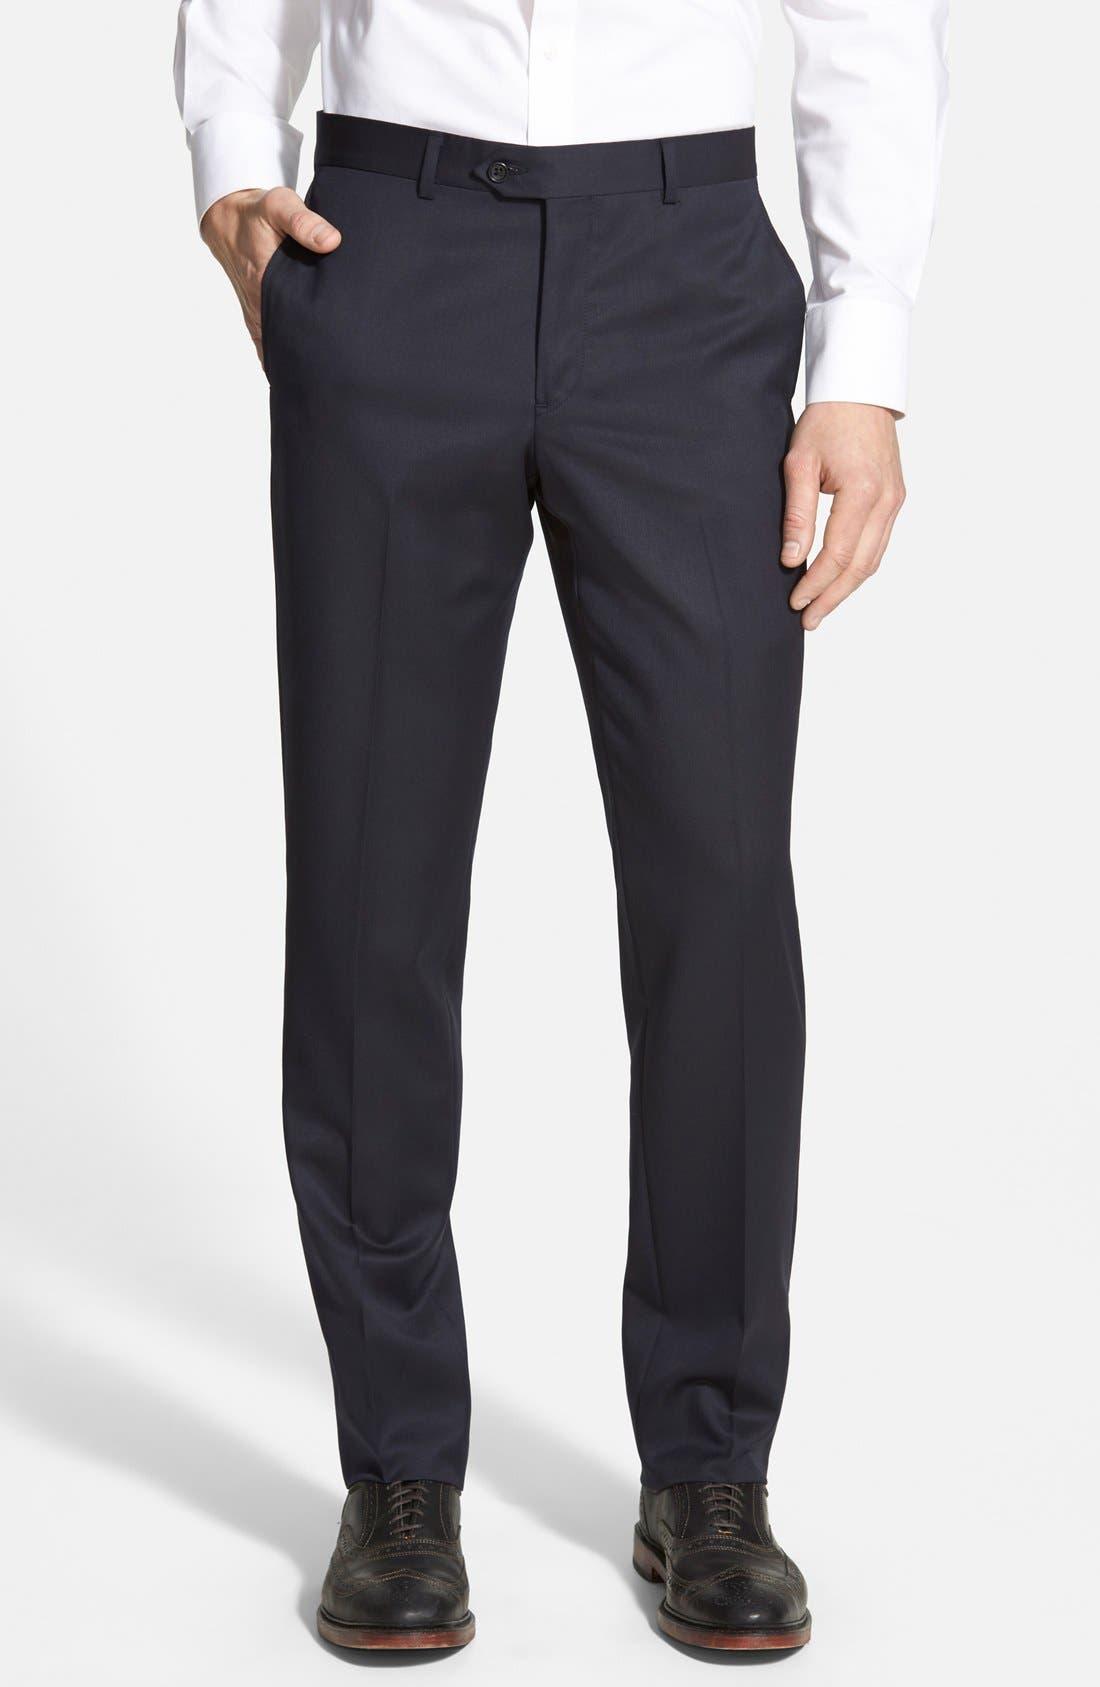 Dressing Pants For Men jr54dOqJ